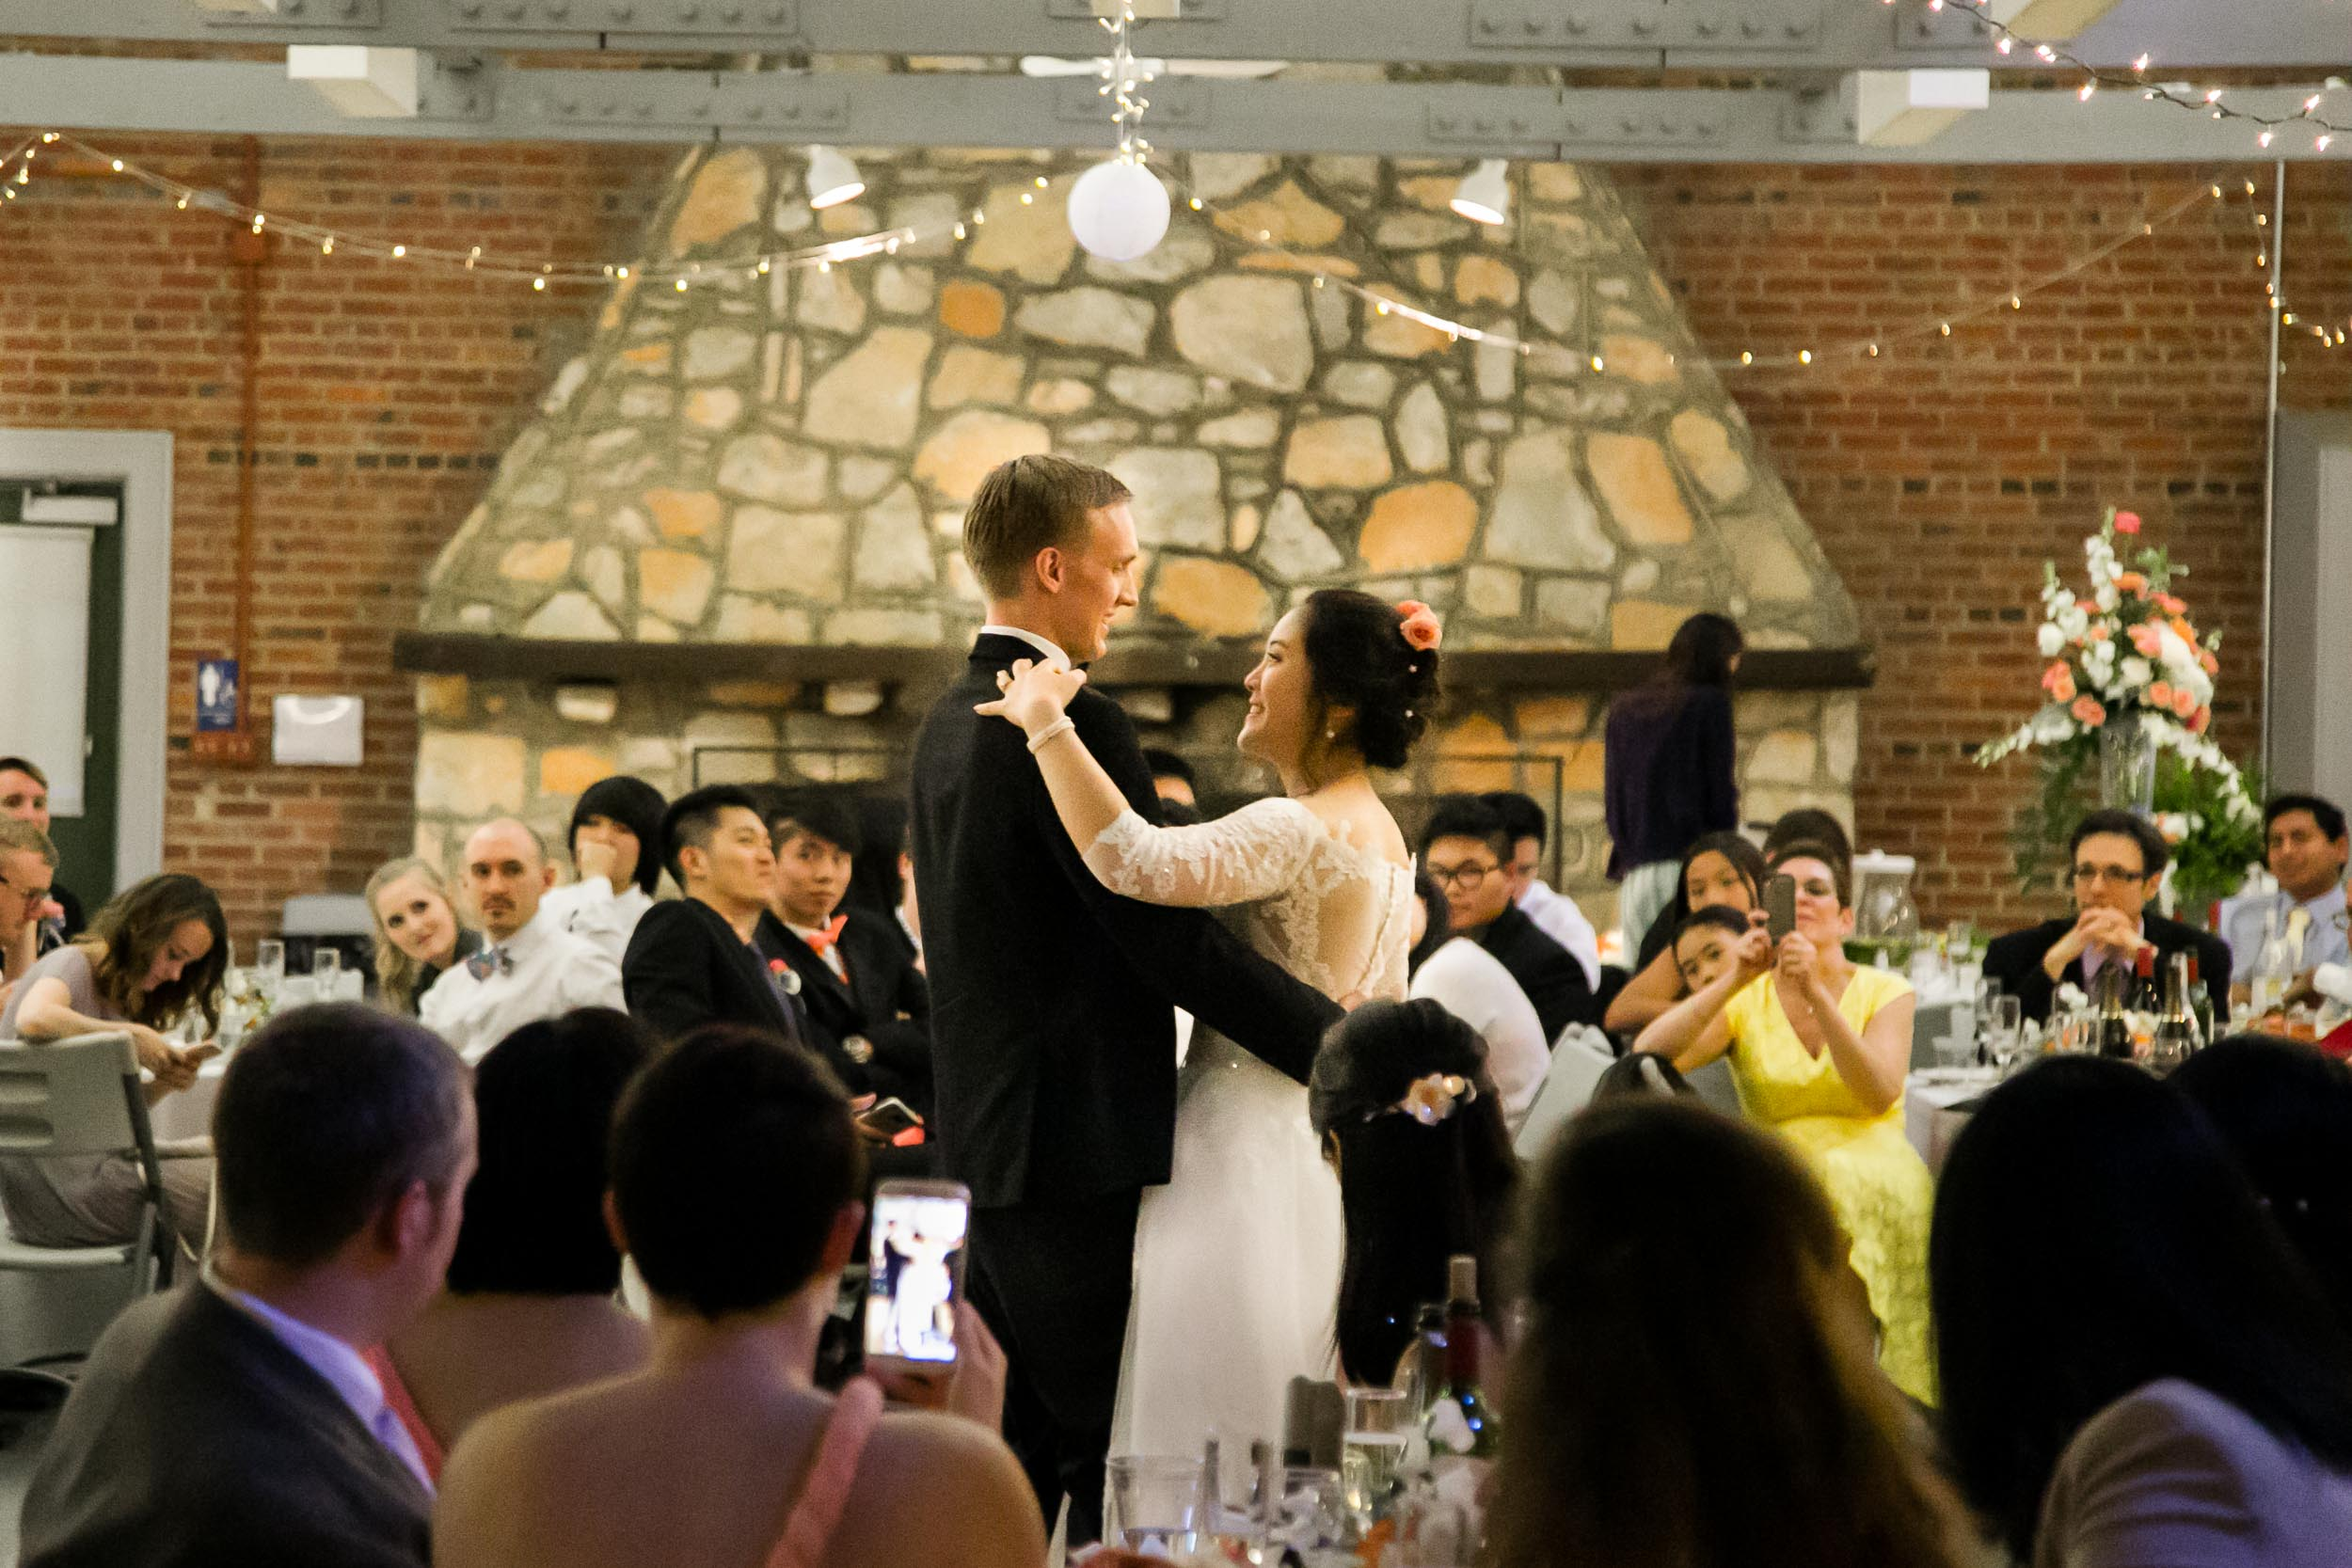 Raleigh Wedding Photographer   G. Lin Photography   Bride and groom dancing